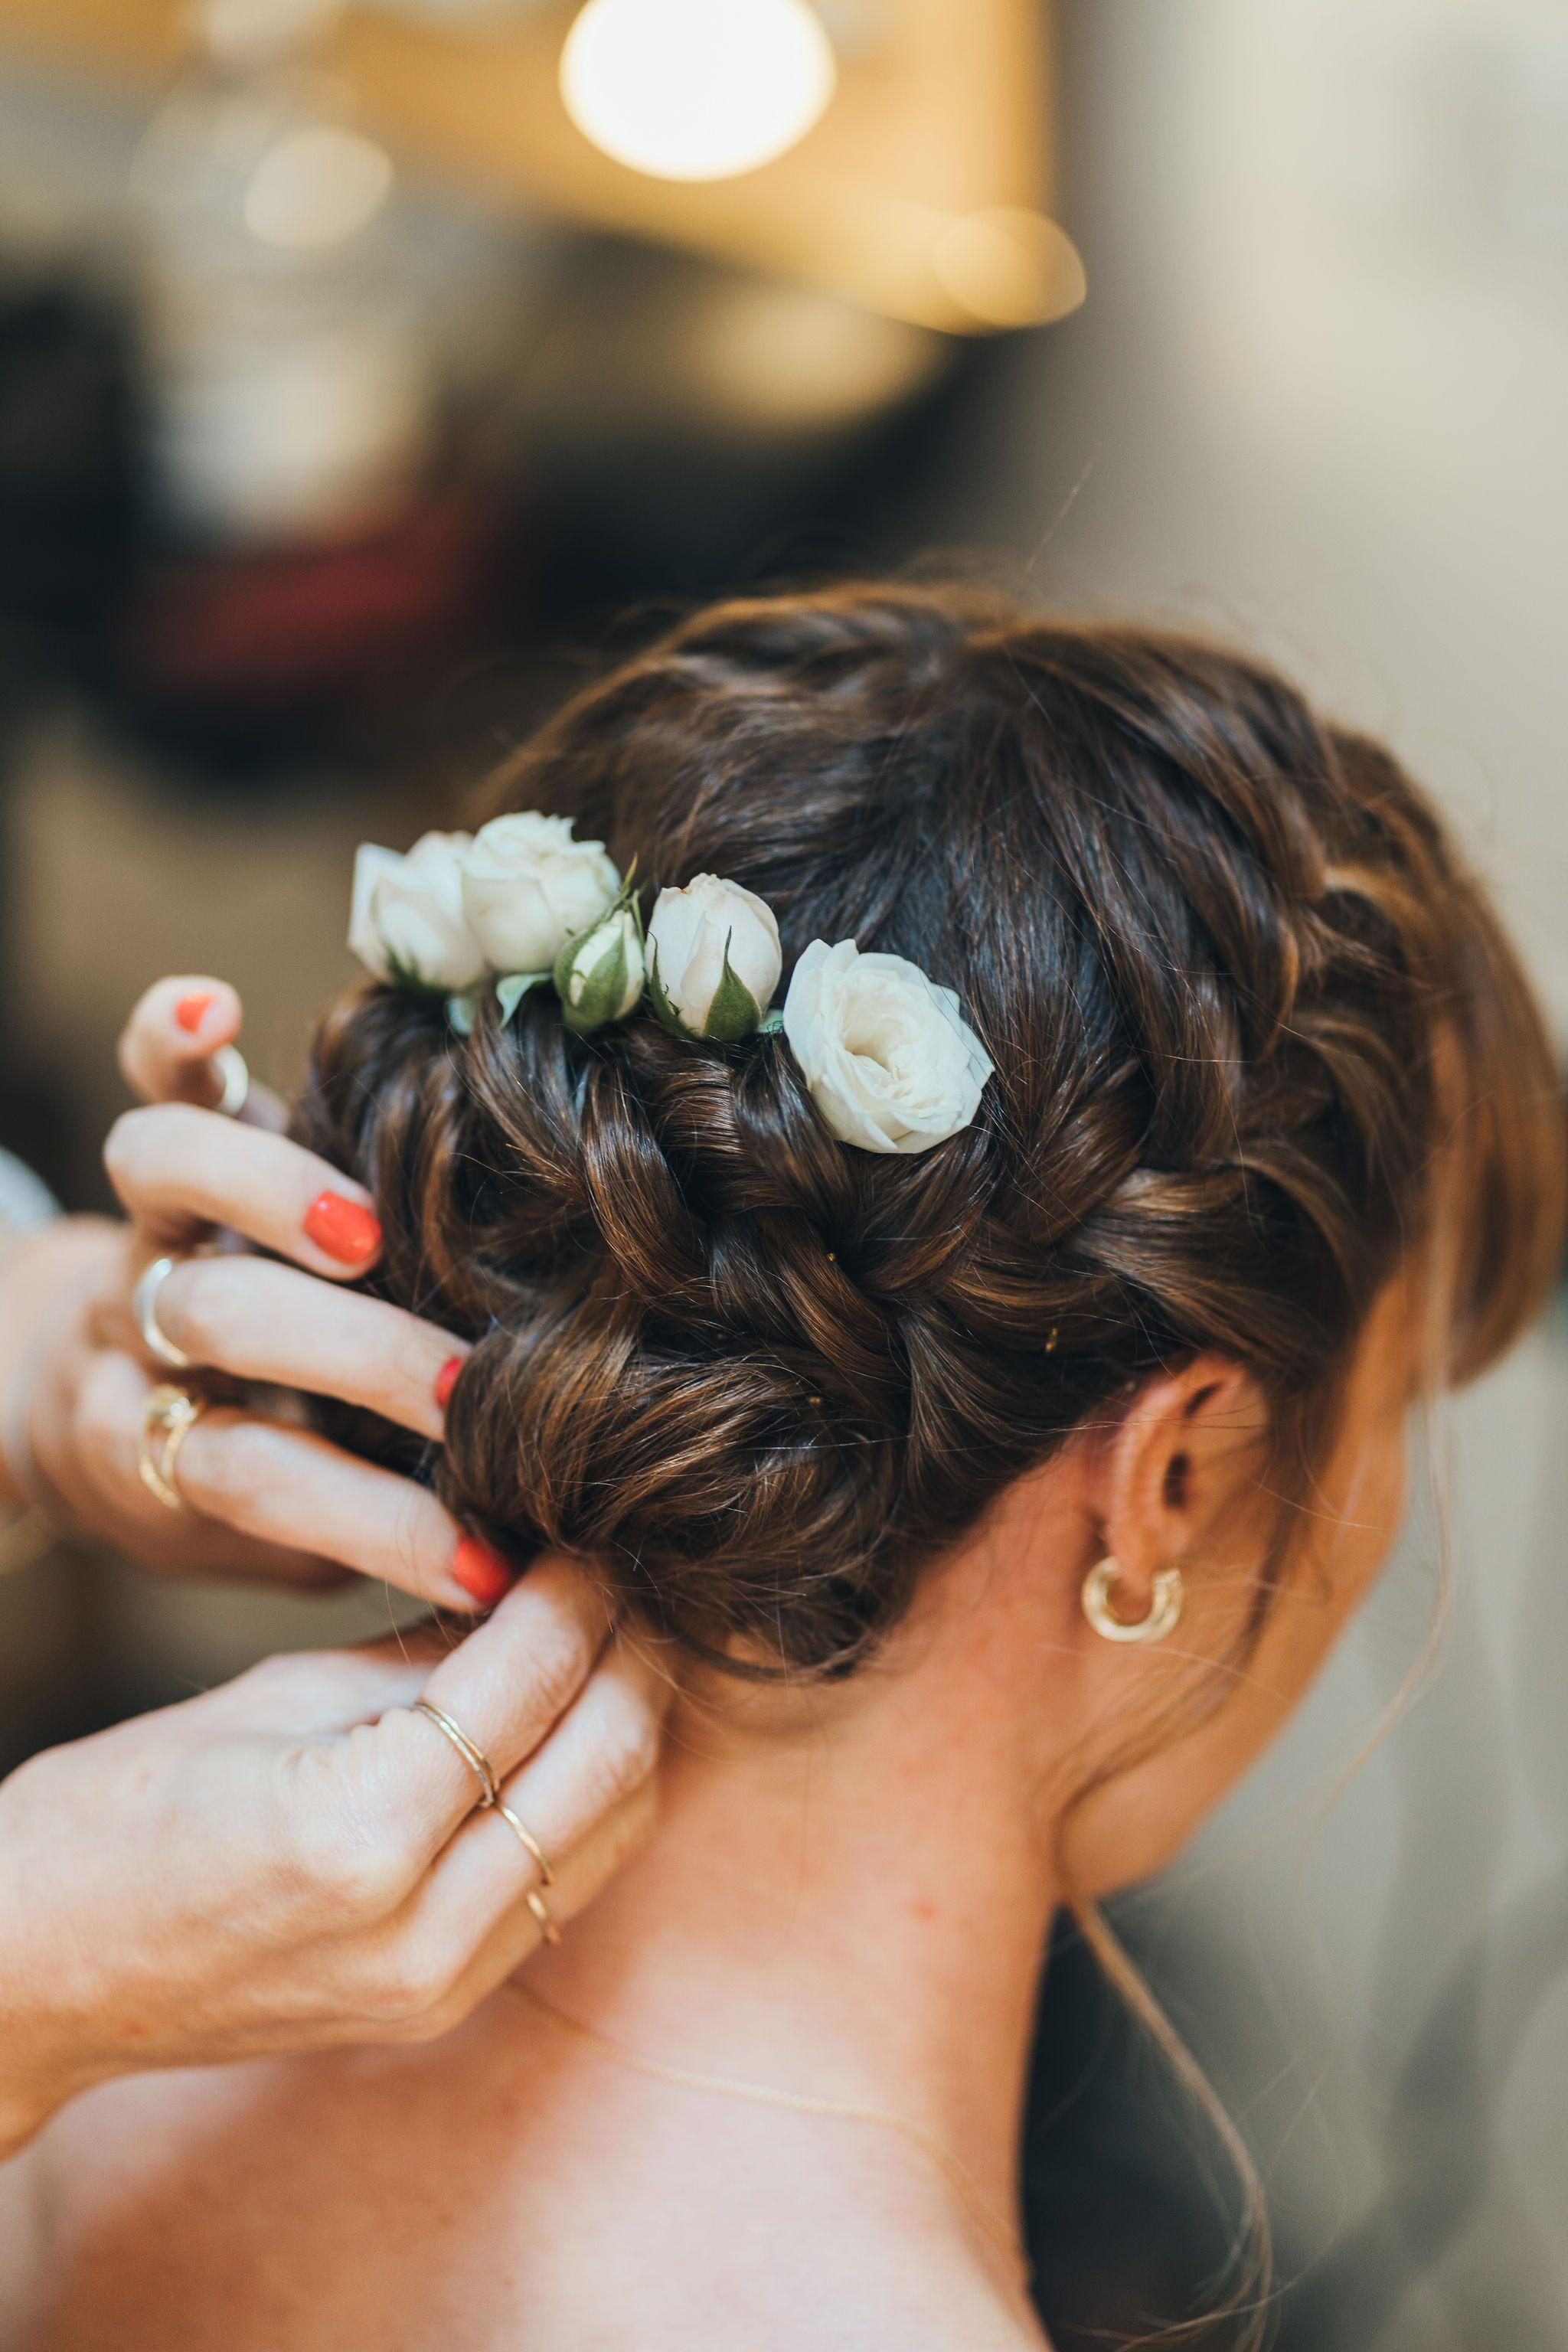 pin by sarah fuhrman on ss20 lulu in 2019 | hair, wedding